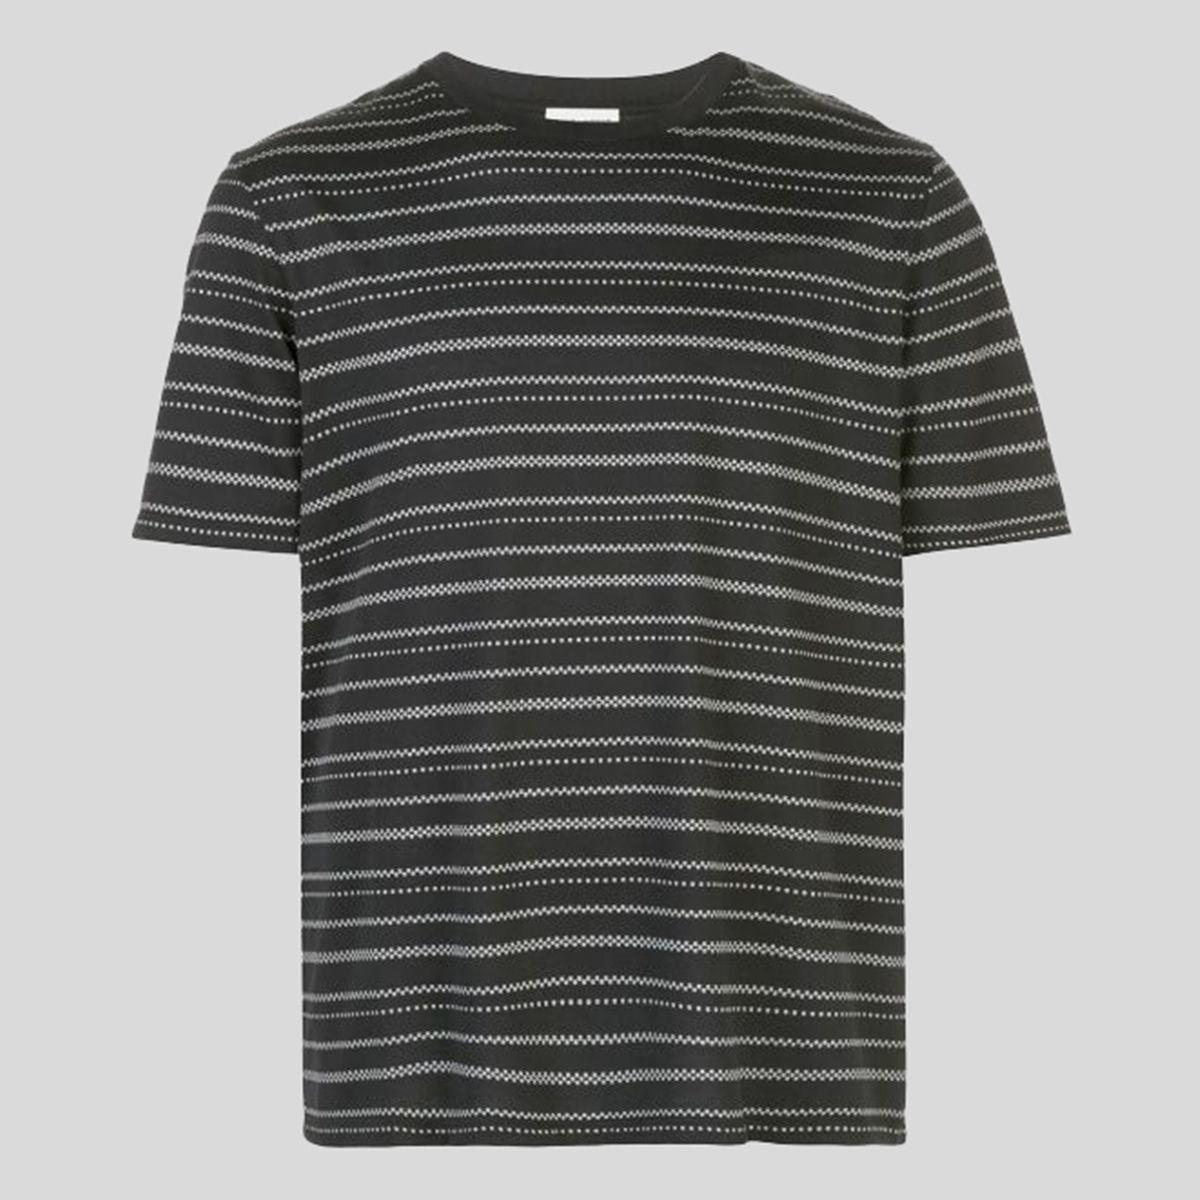 SAINT LAURENT サンローラン ジオメトリック ストライプTシャツ Geometric Striped T-Shirt